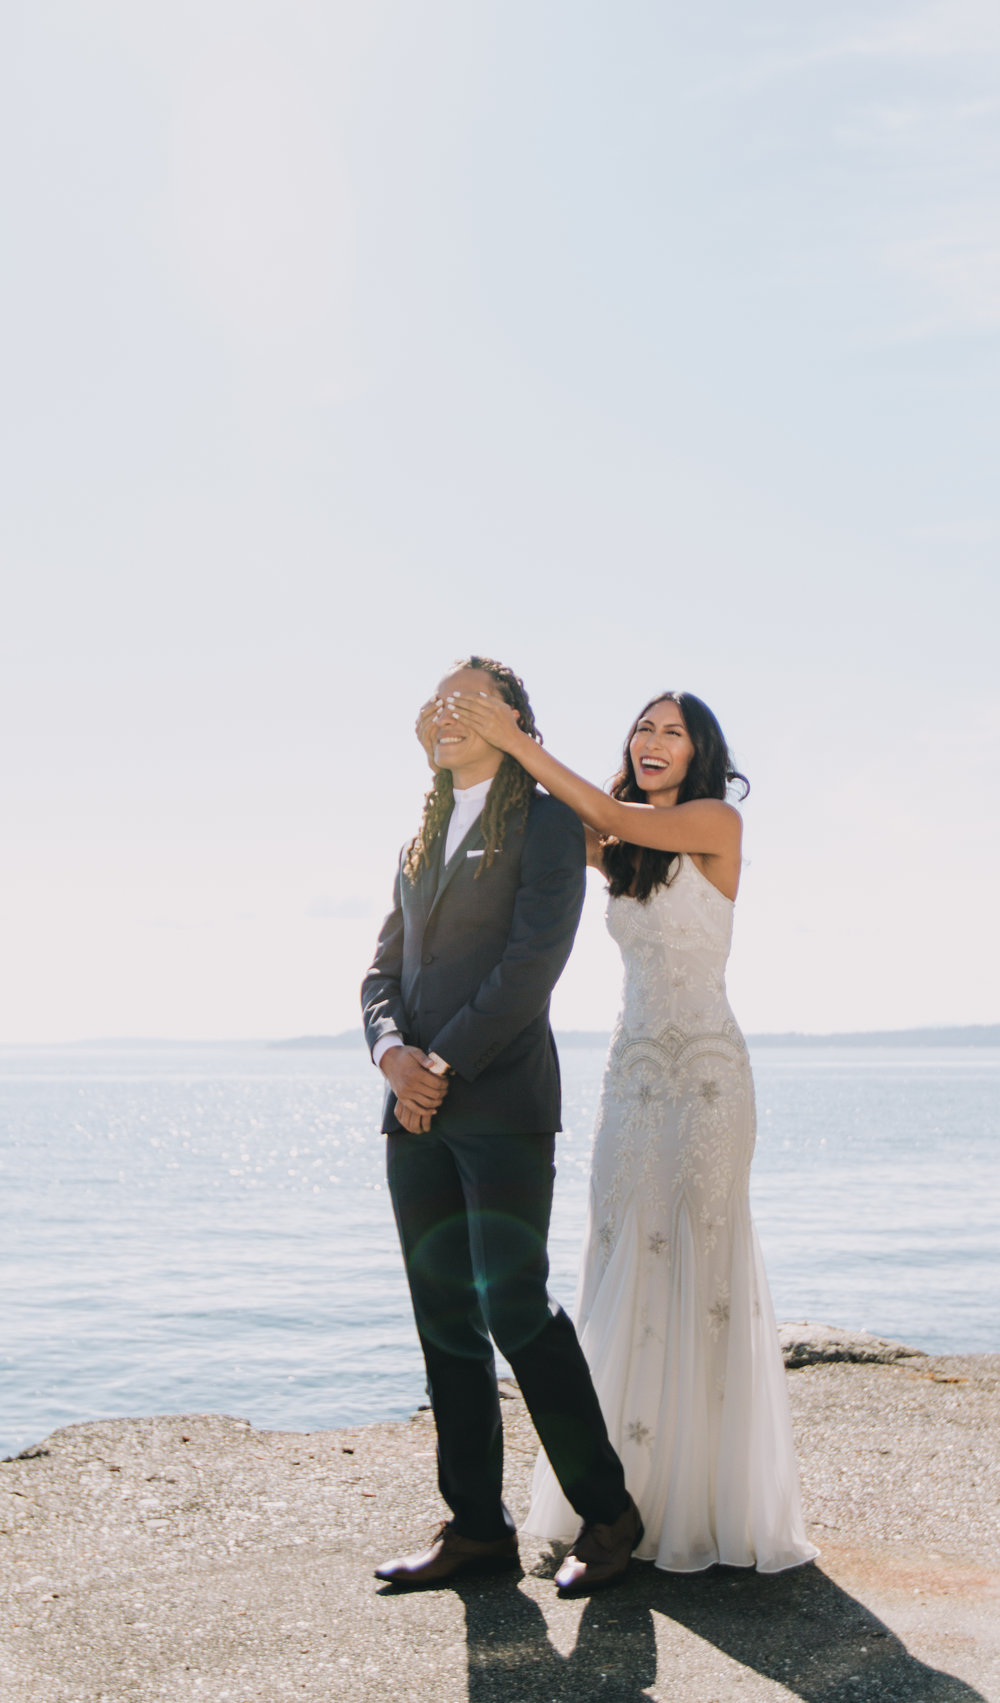 Kaid and Marla Wedding76.JPG